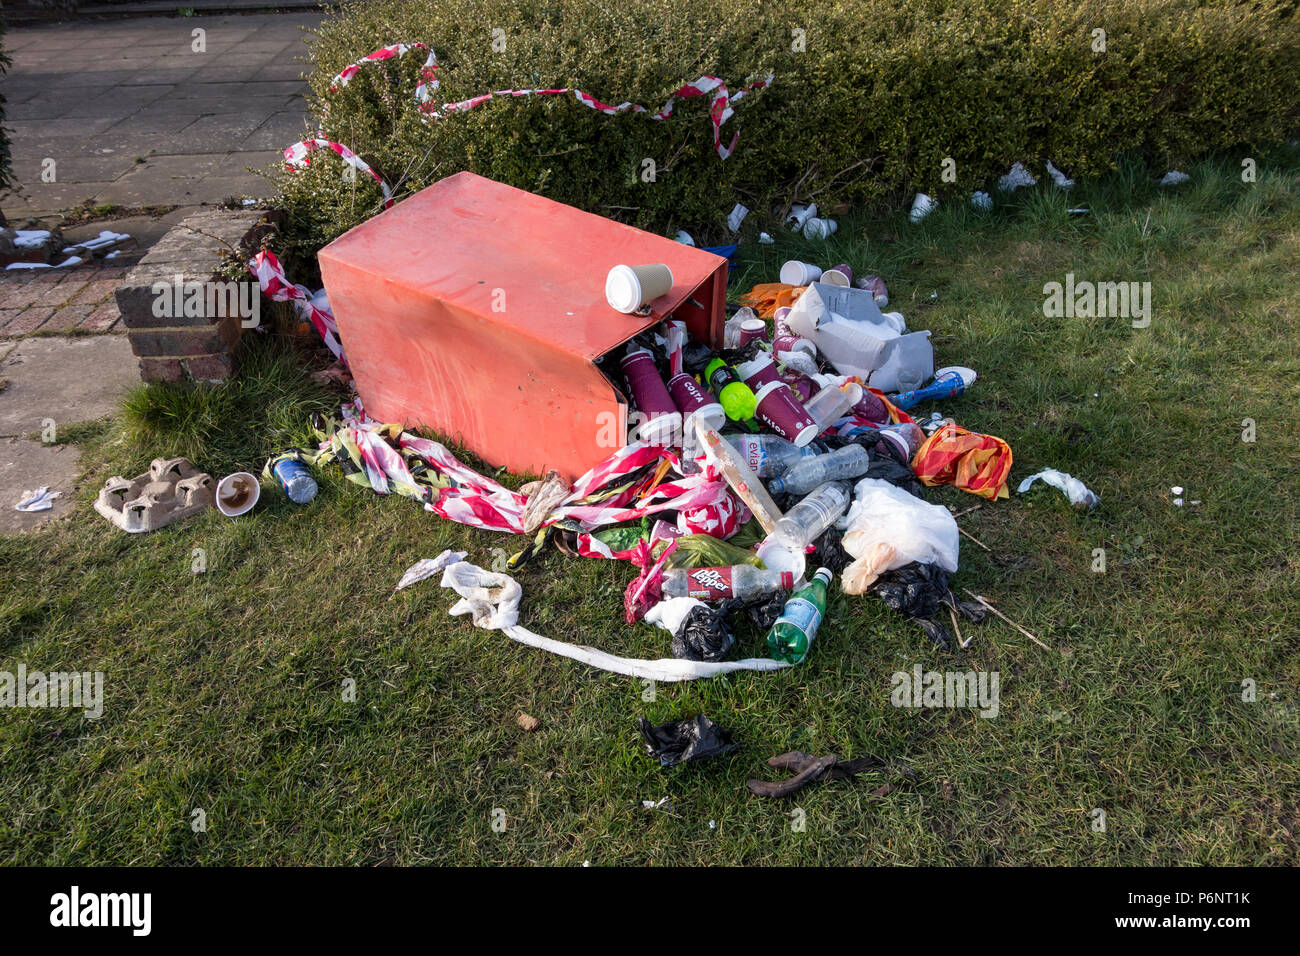 Overflowing garbage bin, UK - Stock Image